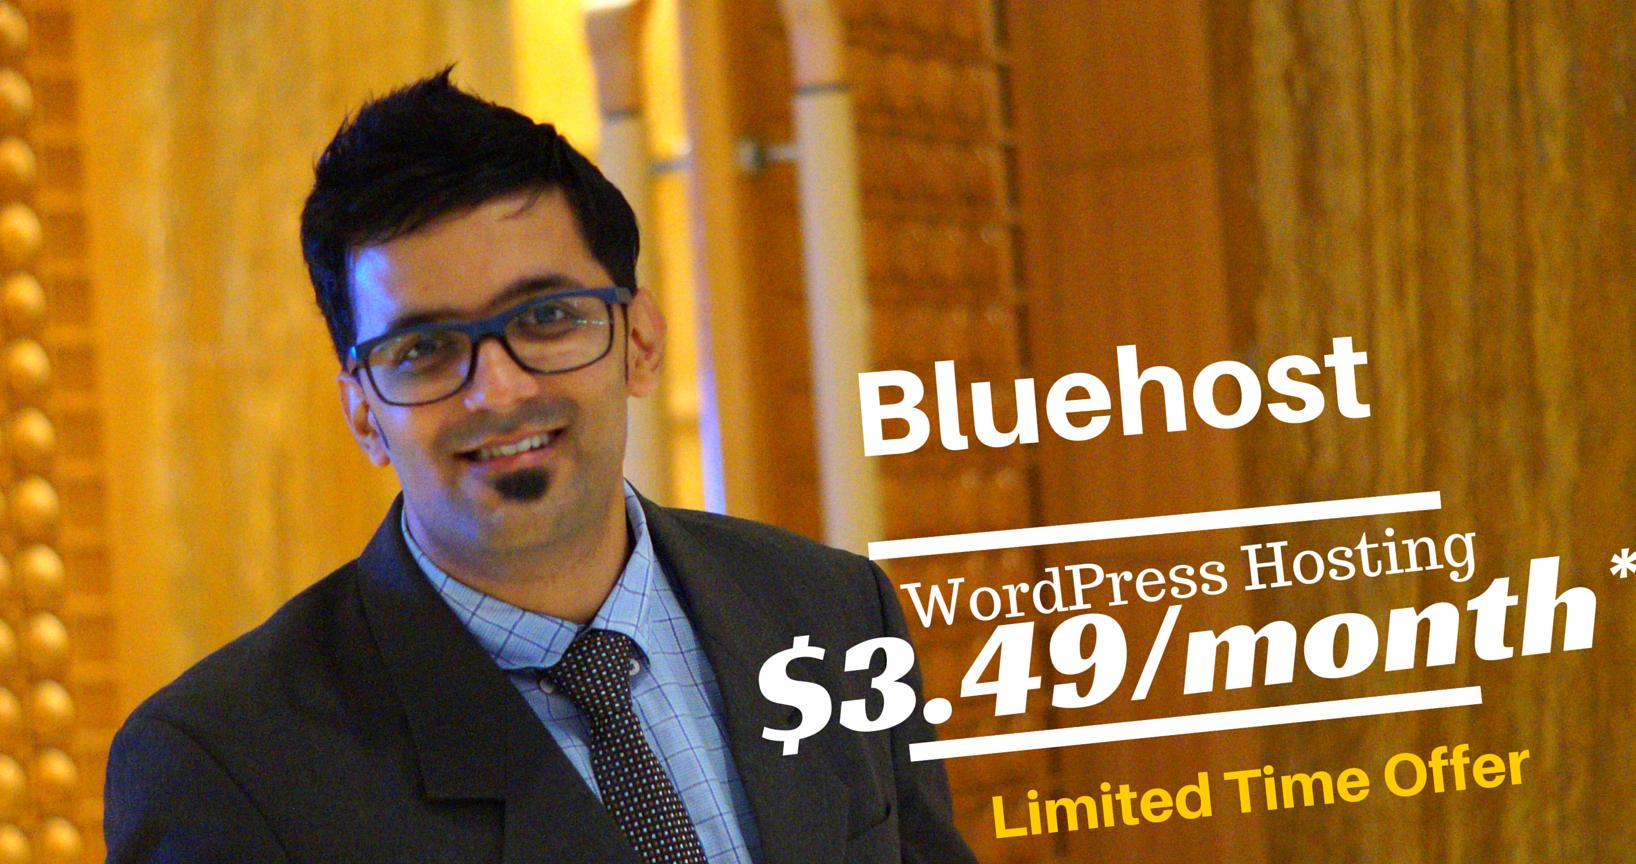 Bluehost Hosting - Build A Website